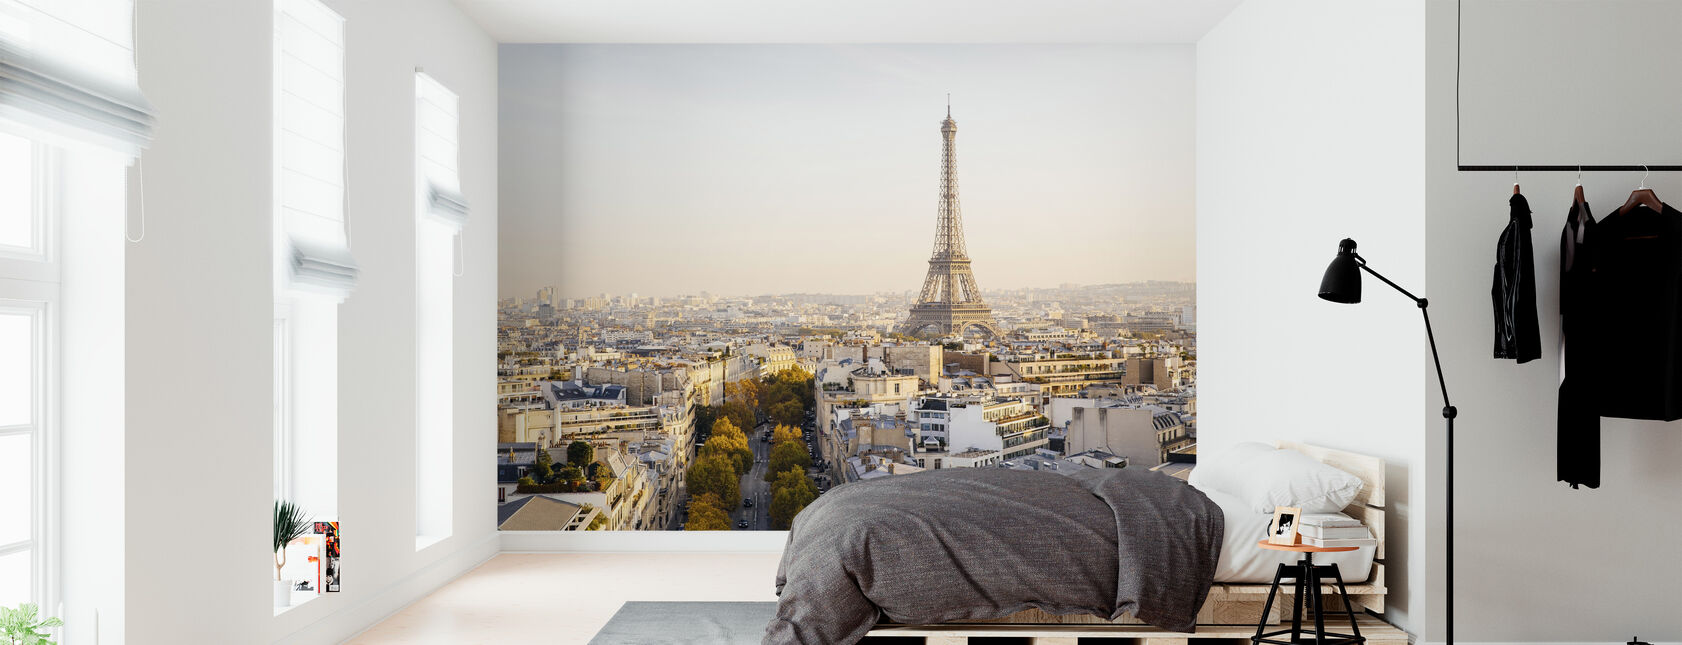 Eiffel Tower and Paris Skyline - Wallpaper - Bedroom